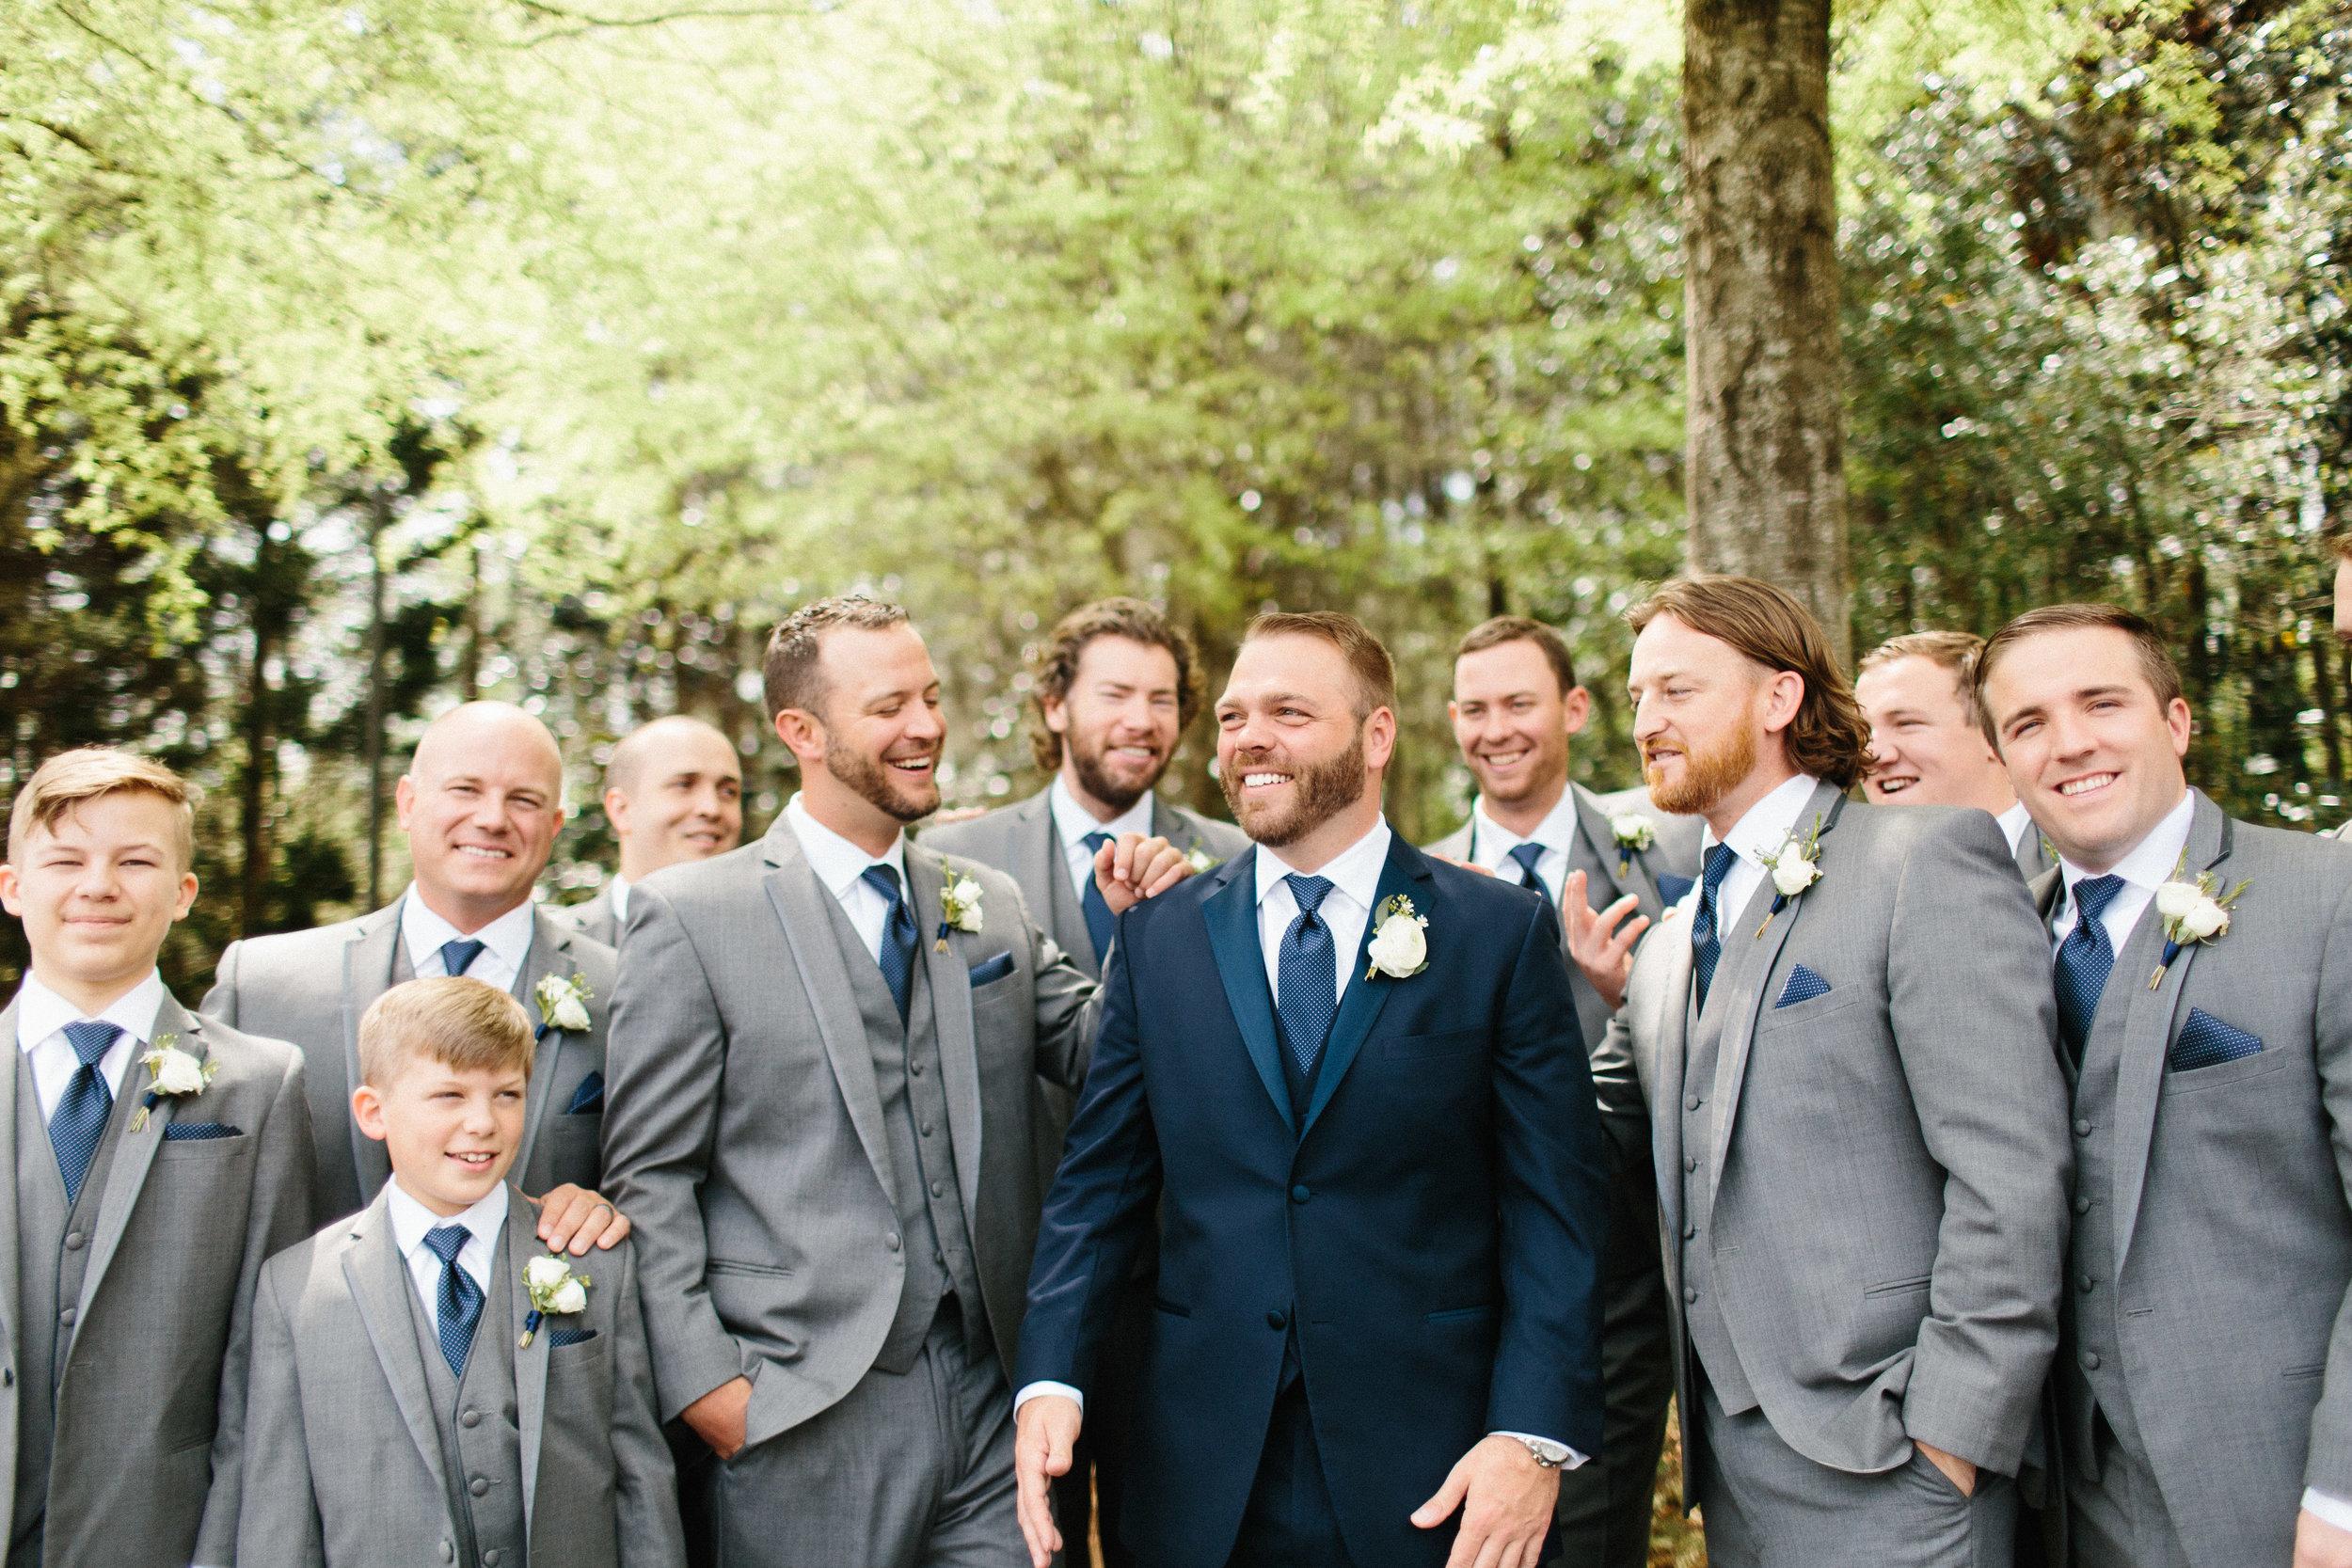 roswell_st_peter_chanel_catholic_avalon_hotel_alpharetta_wedding-1304.jpg